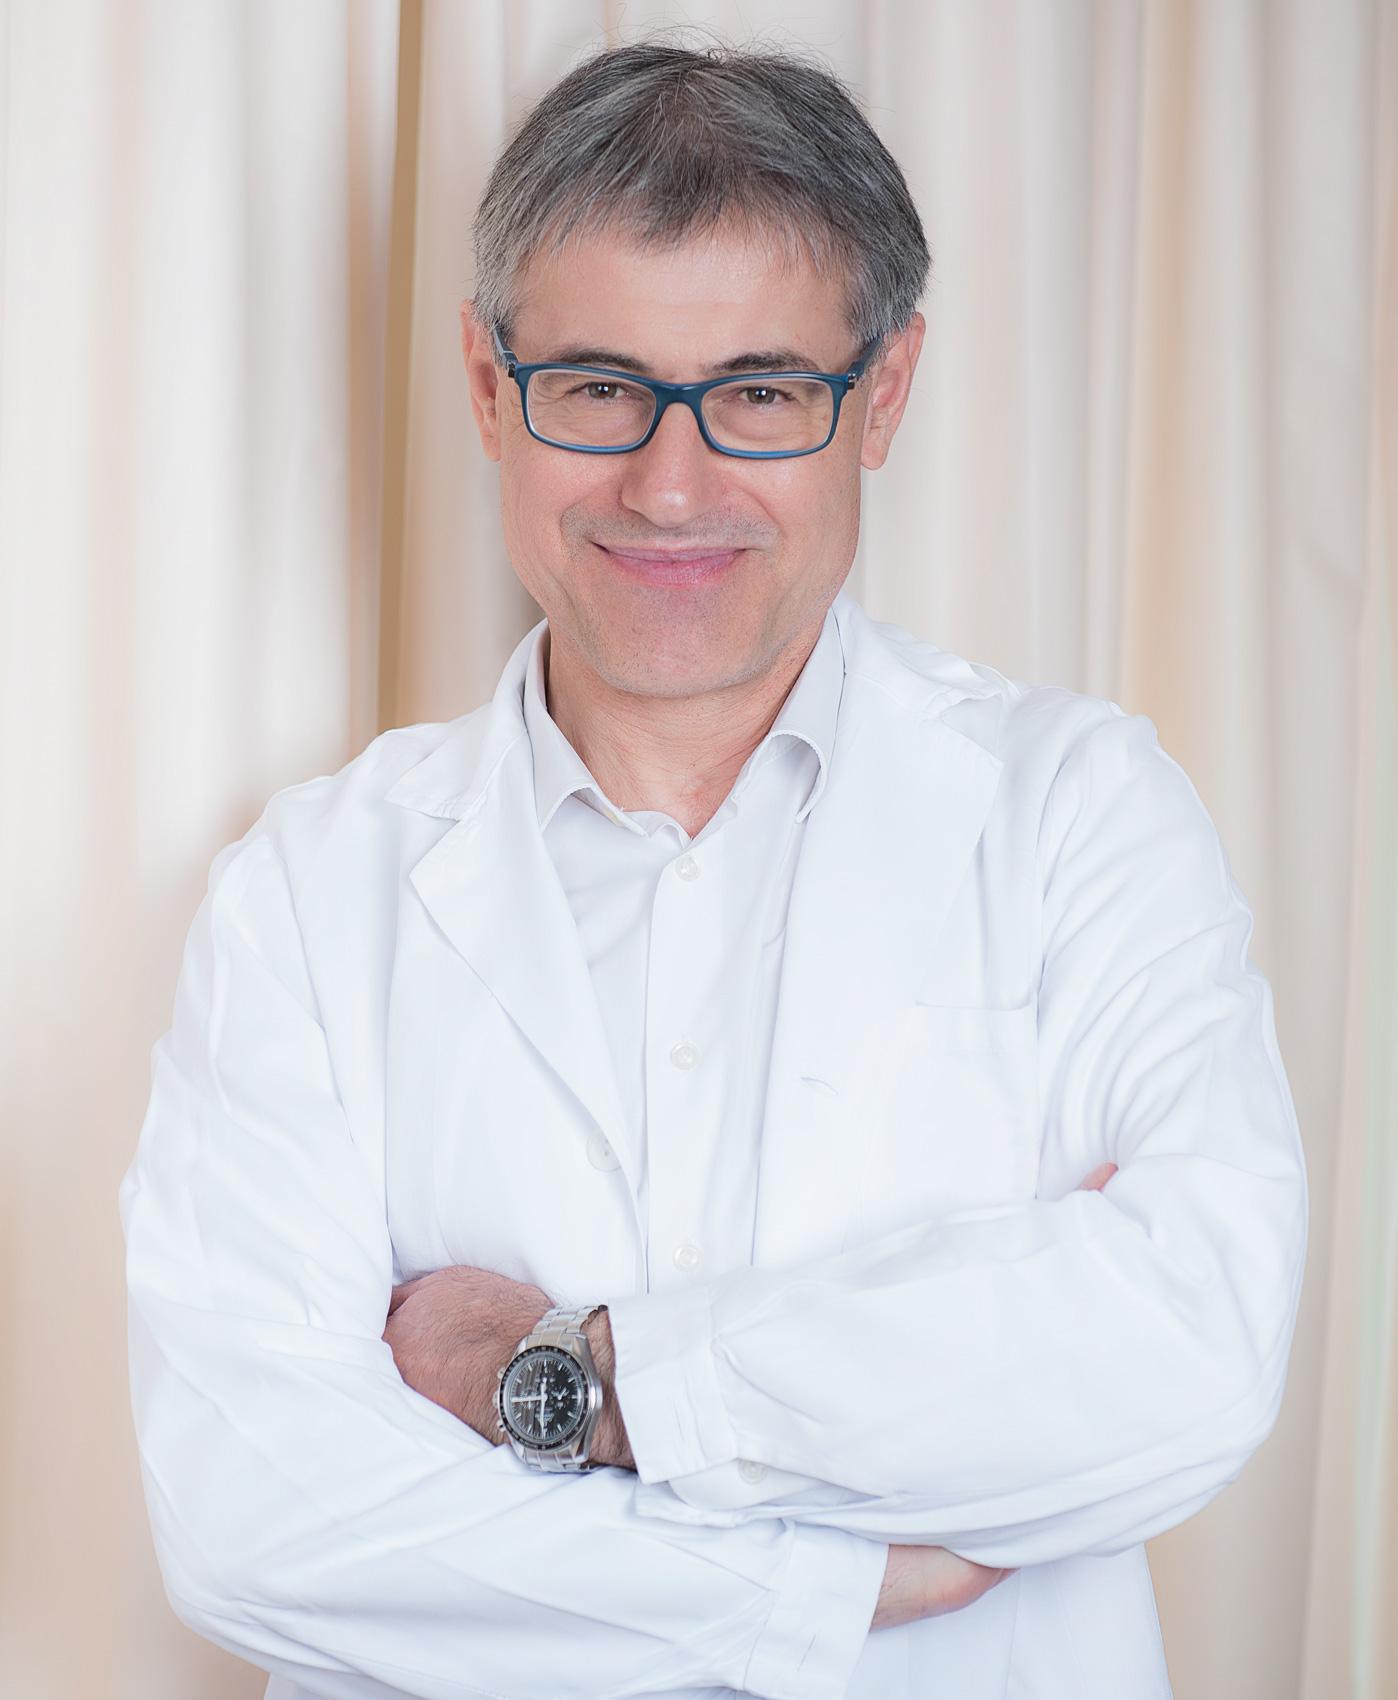 Augenpraxis-Wien-Team-Wilhelm-Burgmüller